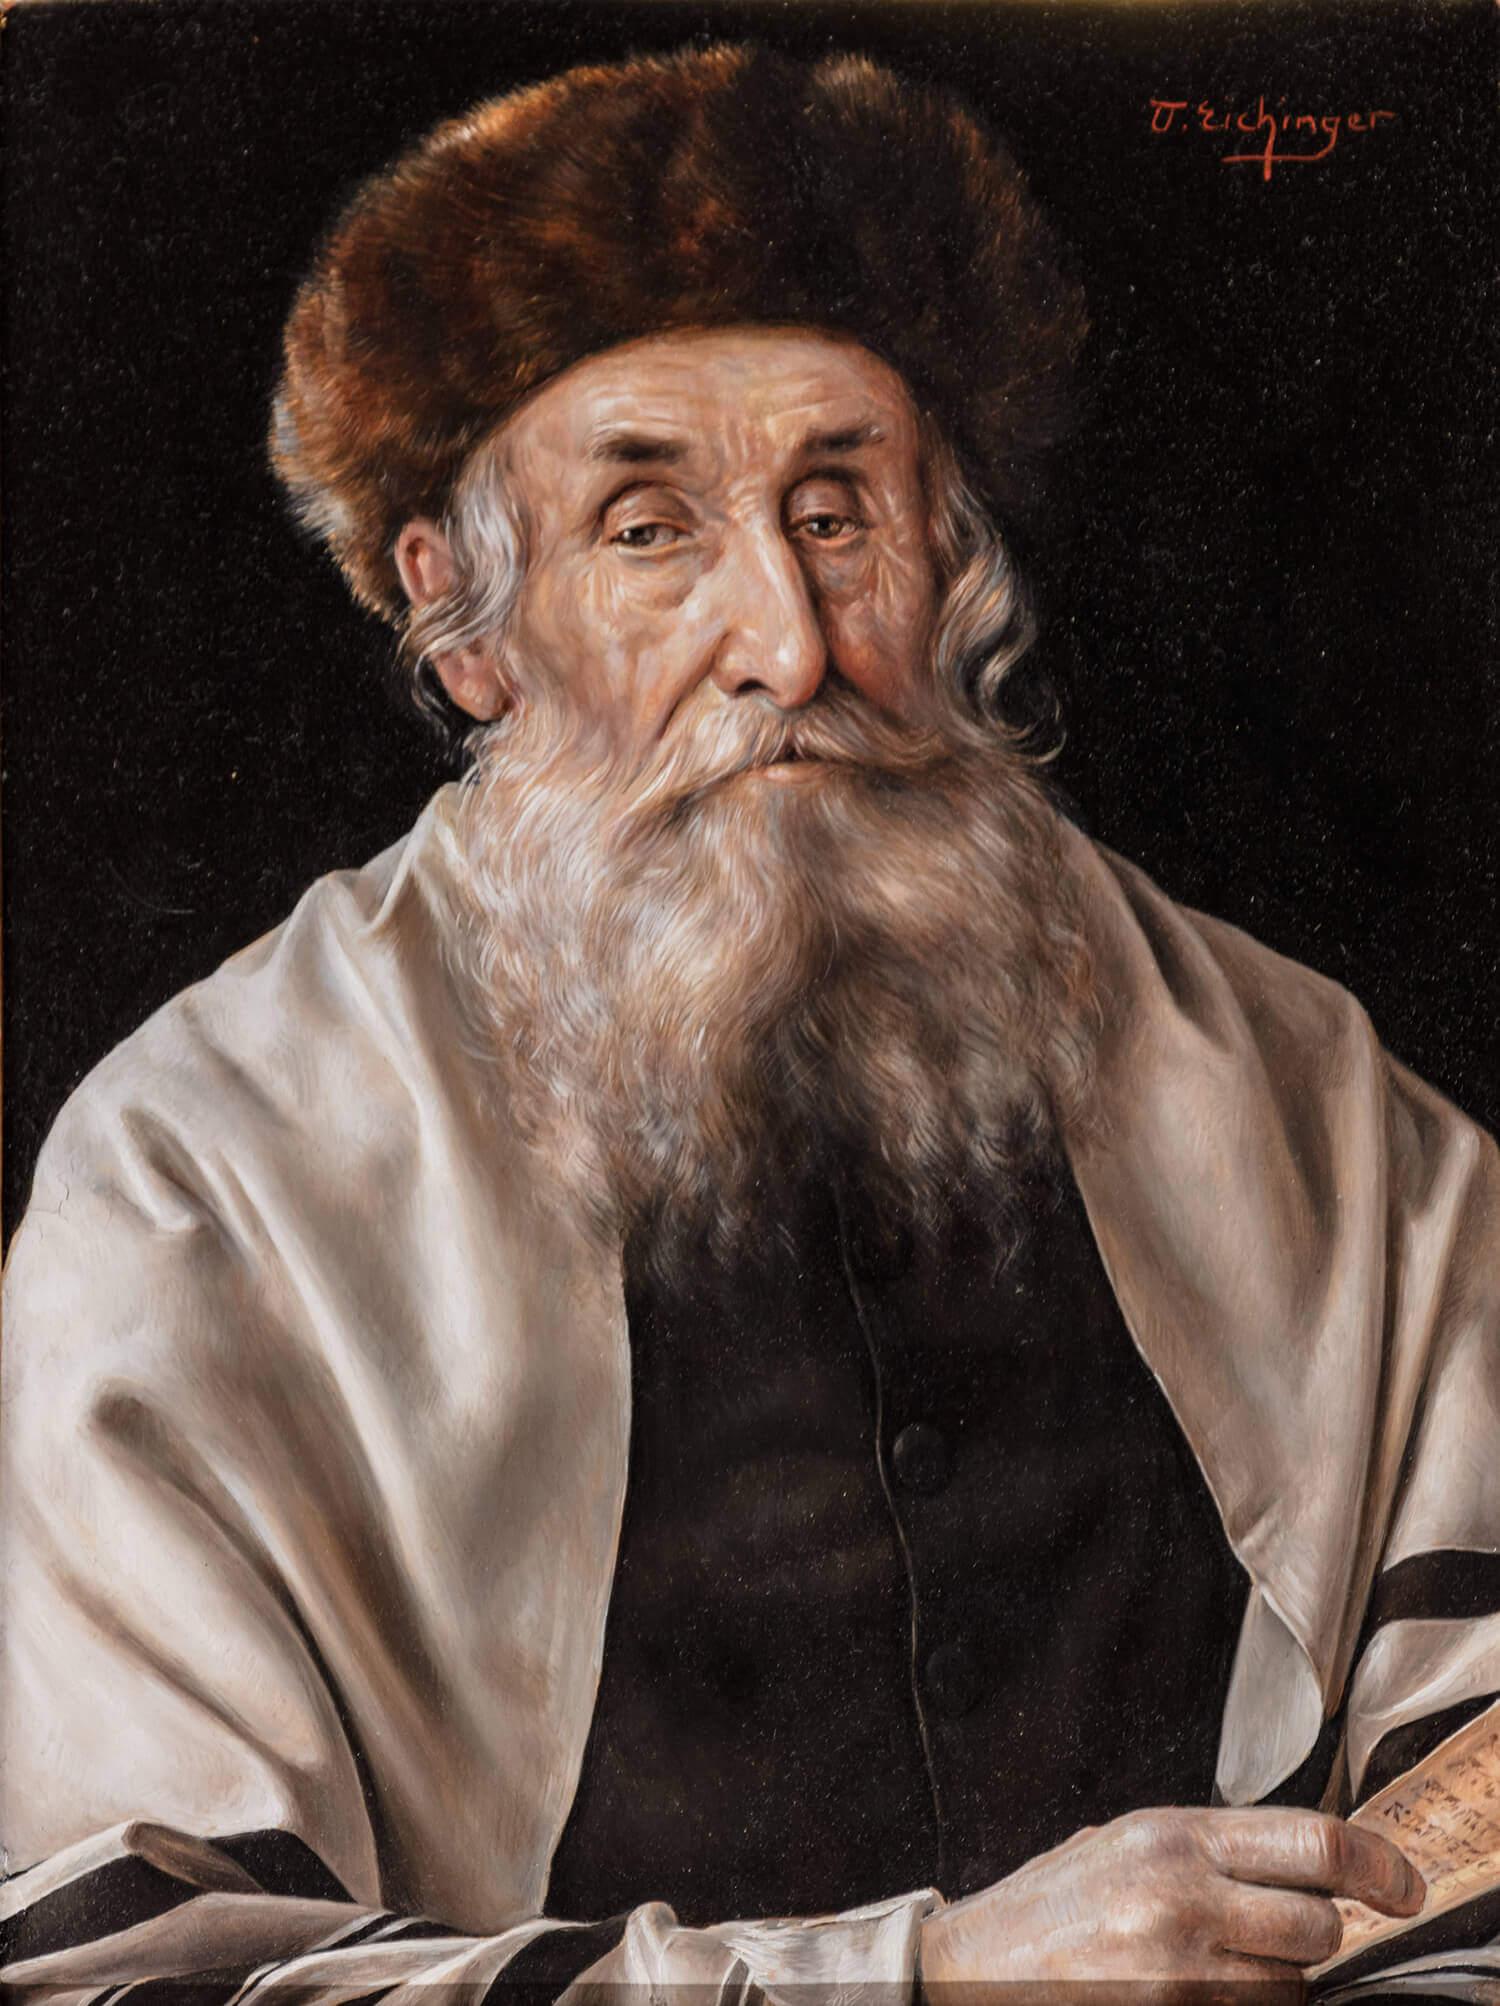 162. OTTO EICHINGER (AUSTRIAN, 1922-2004)